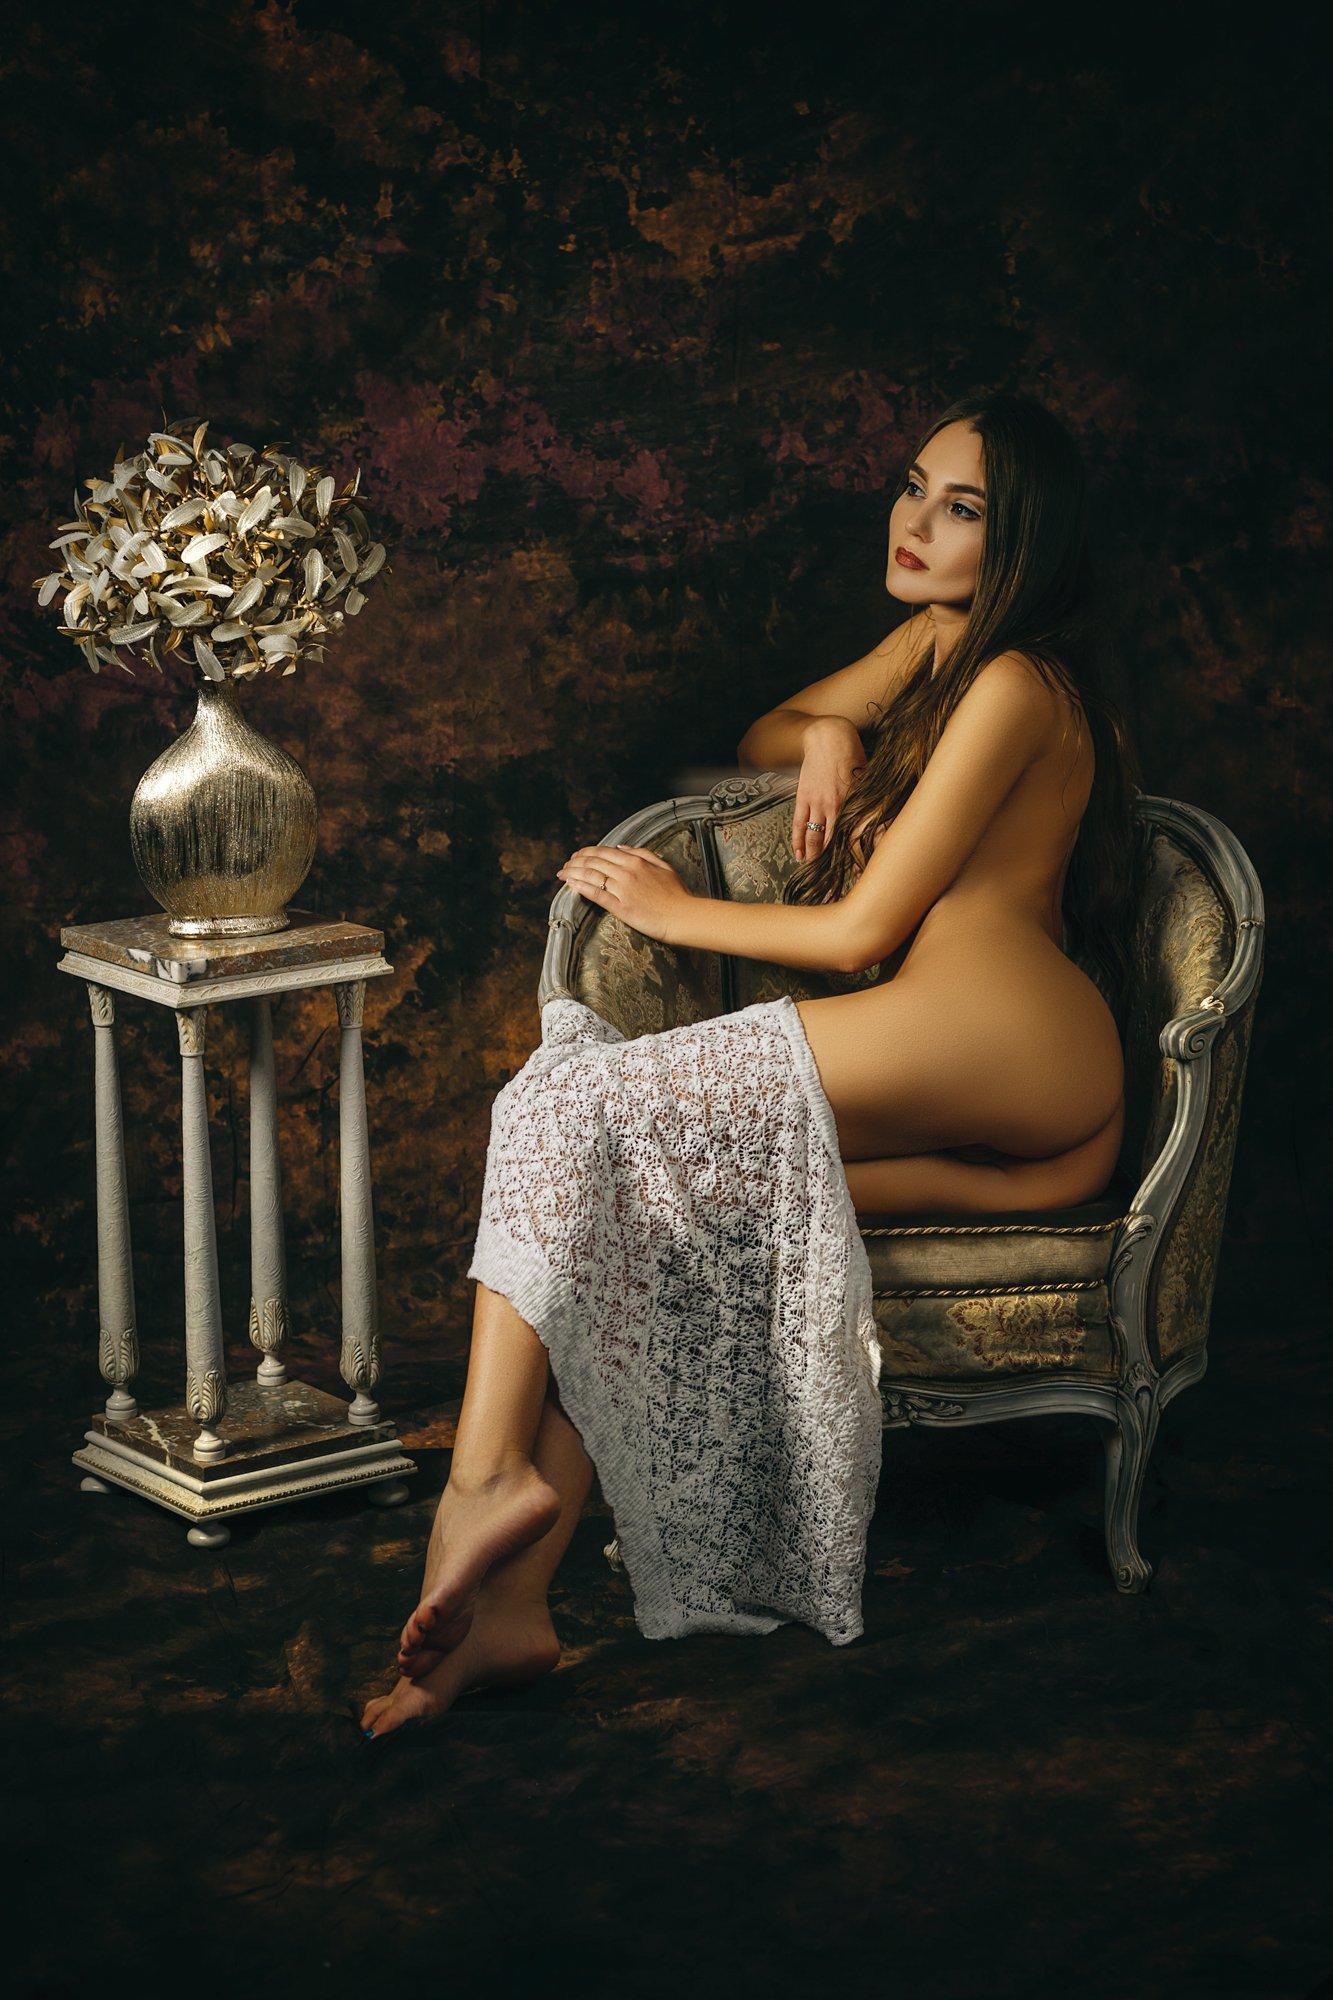 woman, portrait, nude, art, studio, Руслан Болгов (Axe)